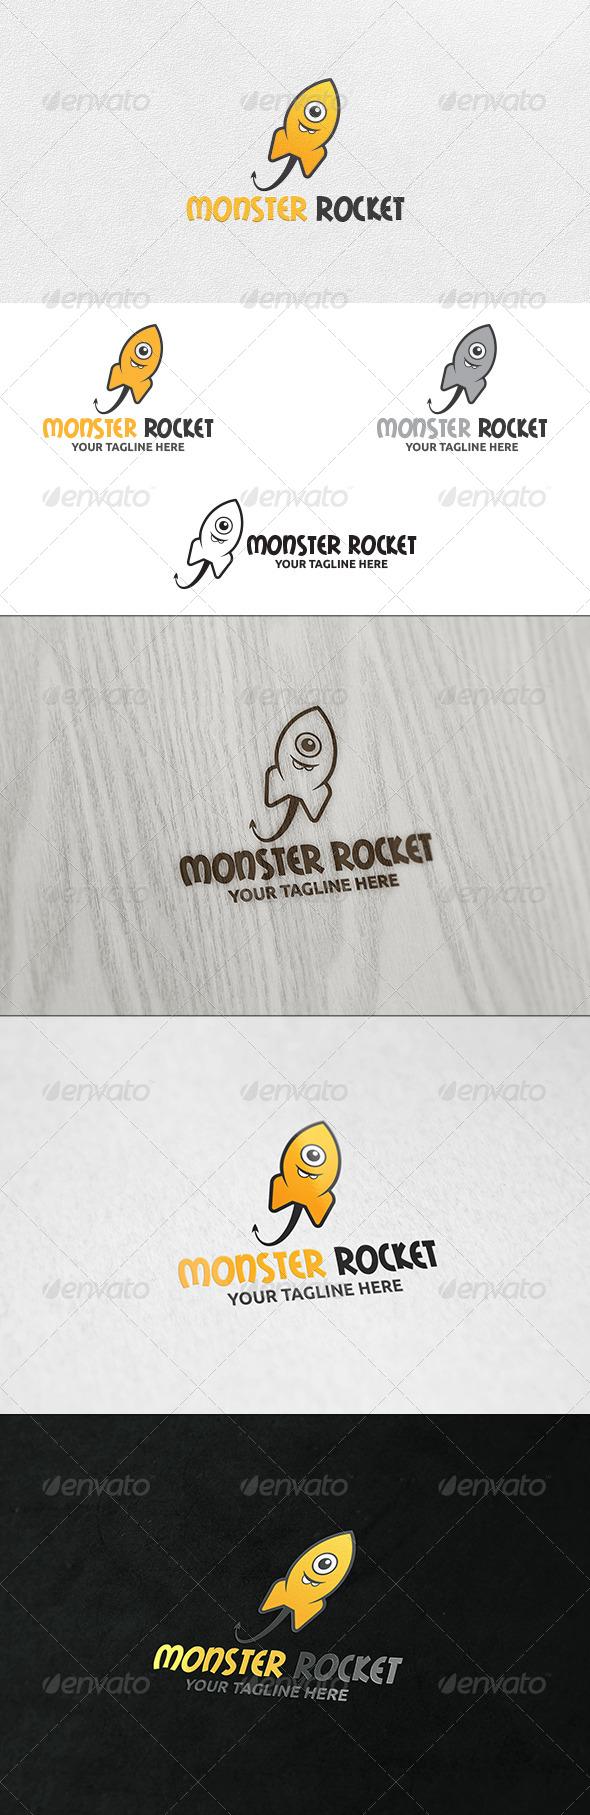 GraphicRiver Monster Rocket Logo Template 6583019